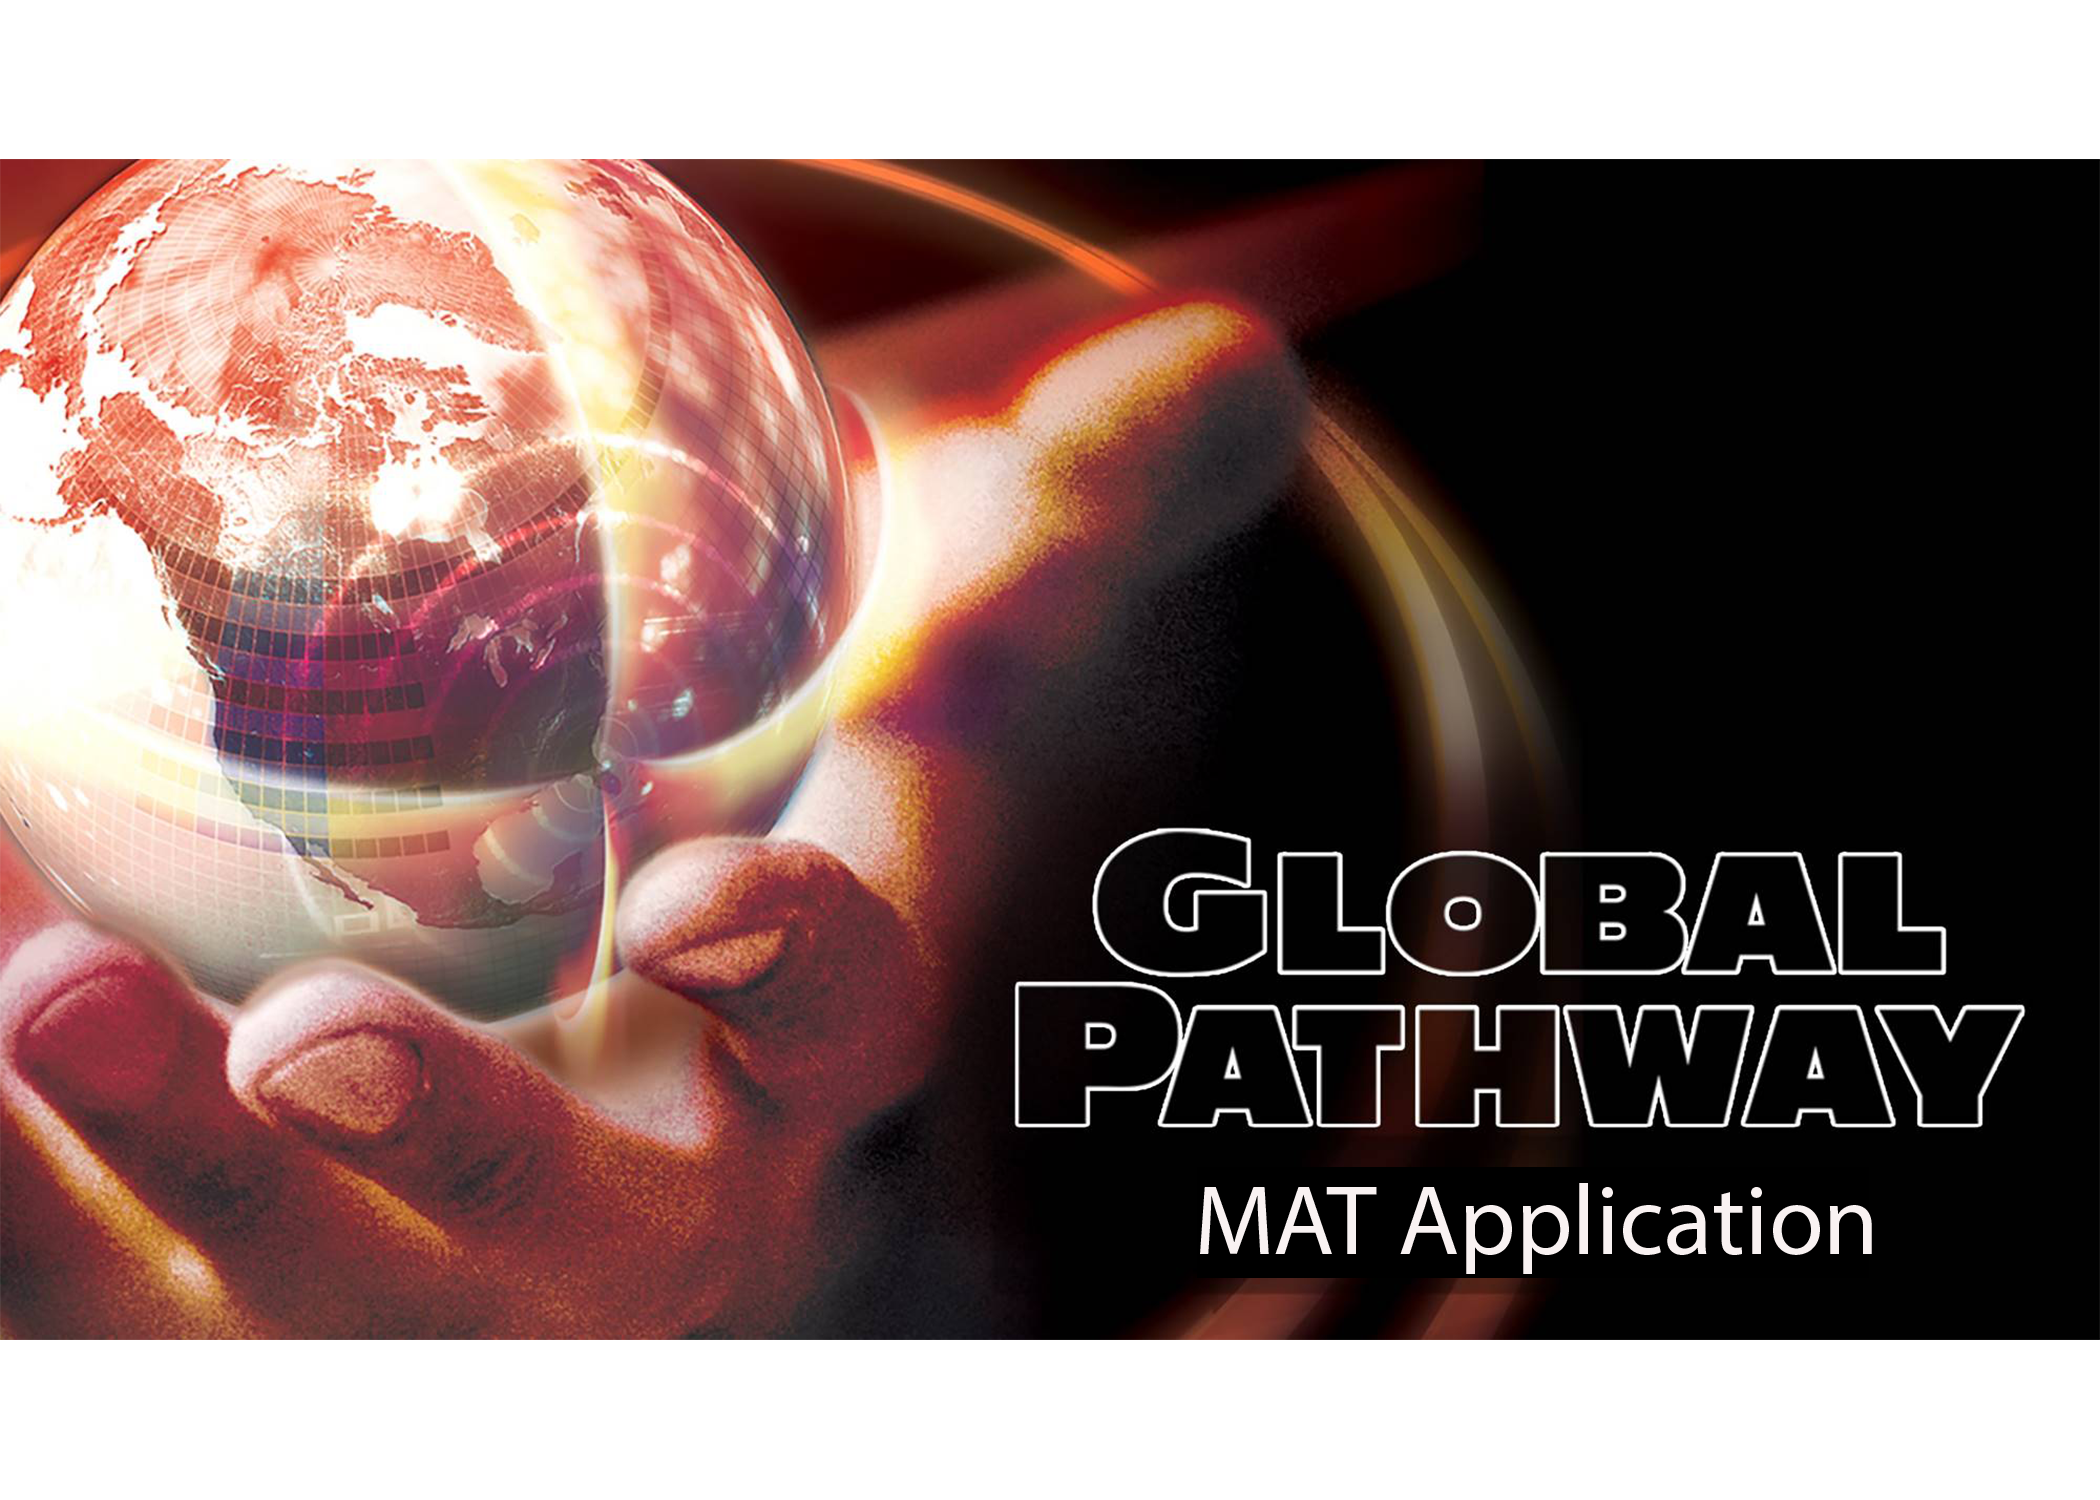 Global Pathway Slide (GPIN)-MAT Application.png